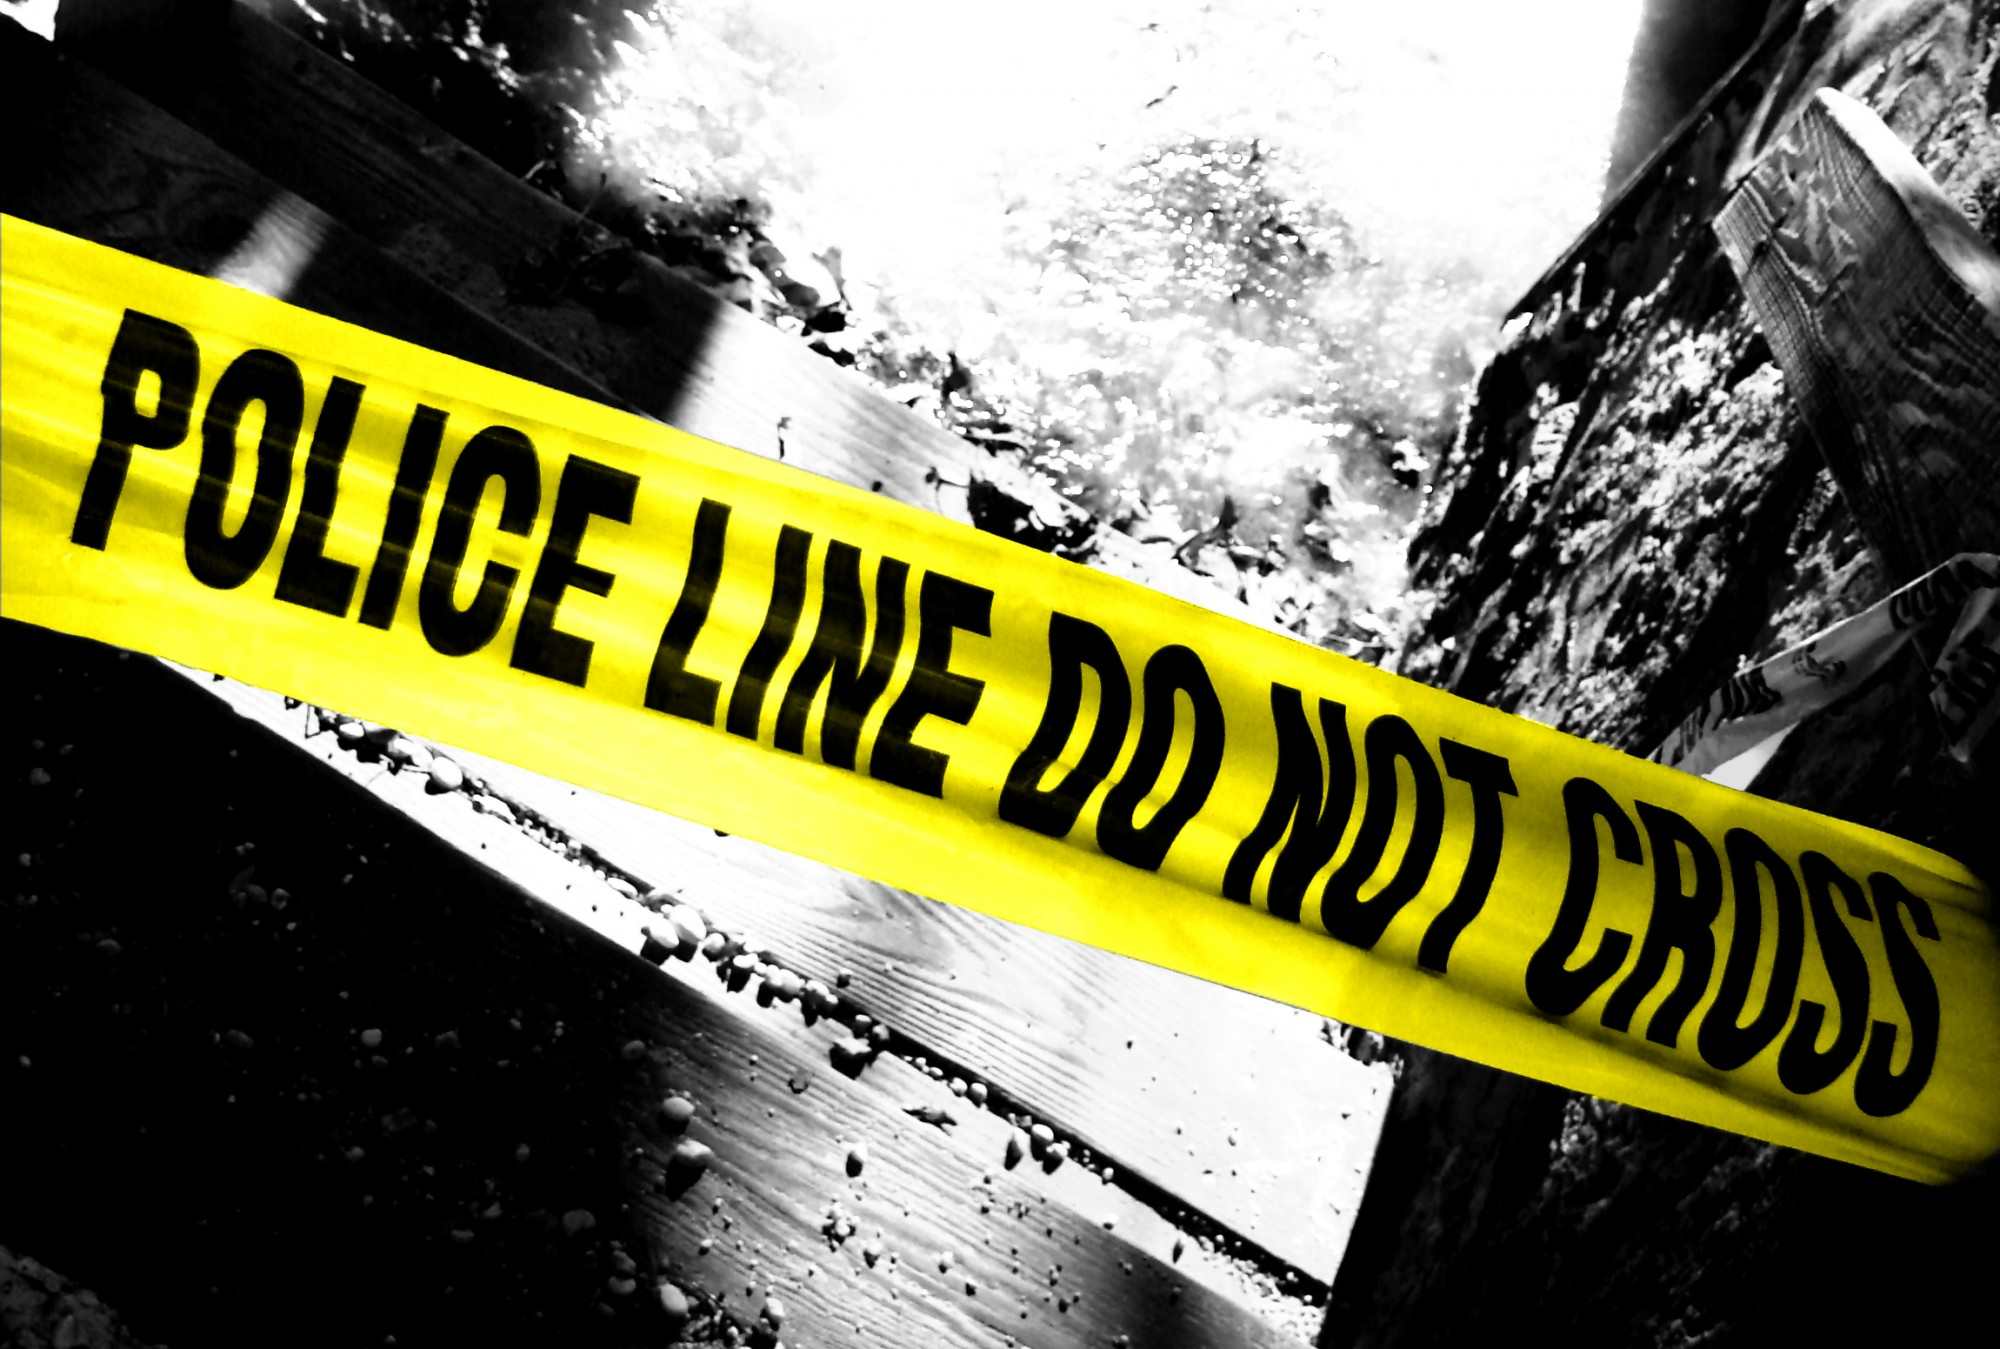 MAN DEAD IN OVERNIGHT SHOOTING